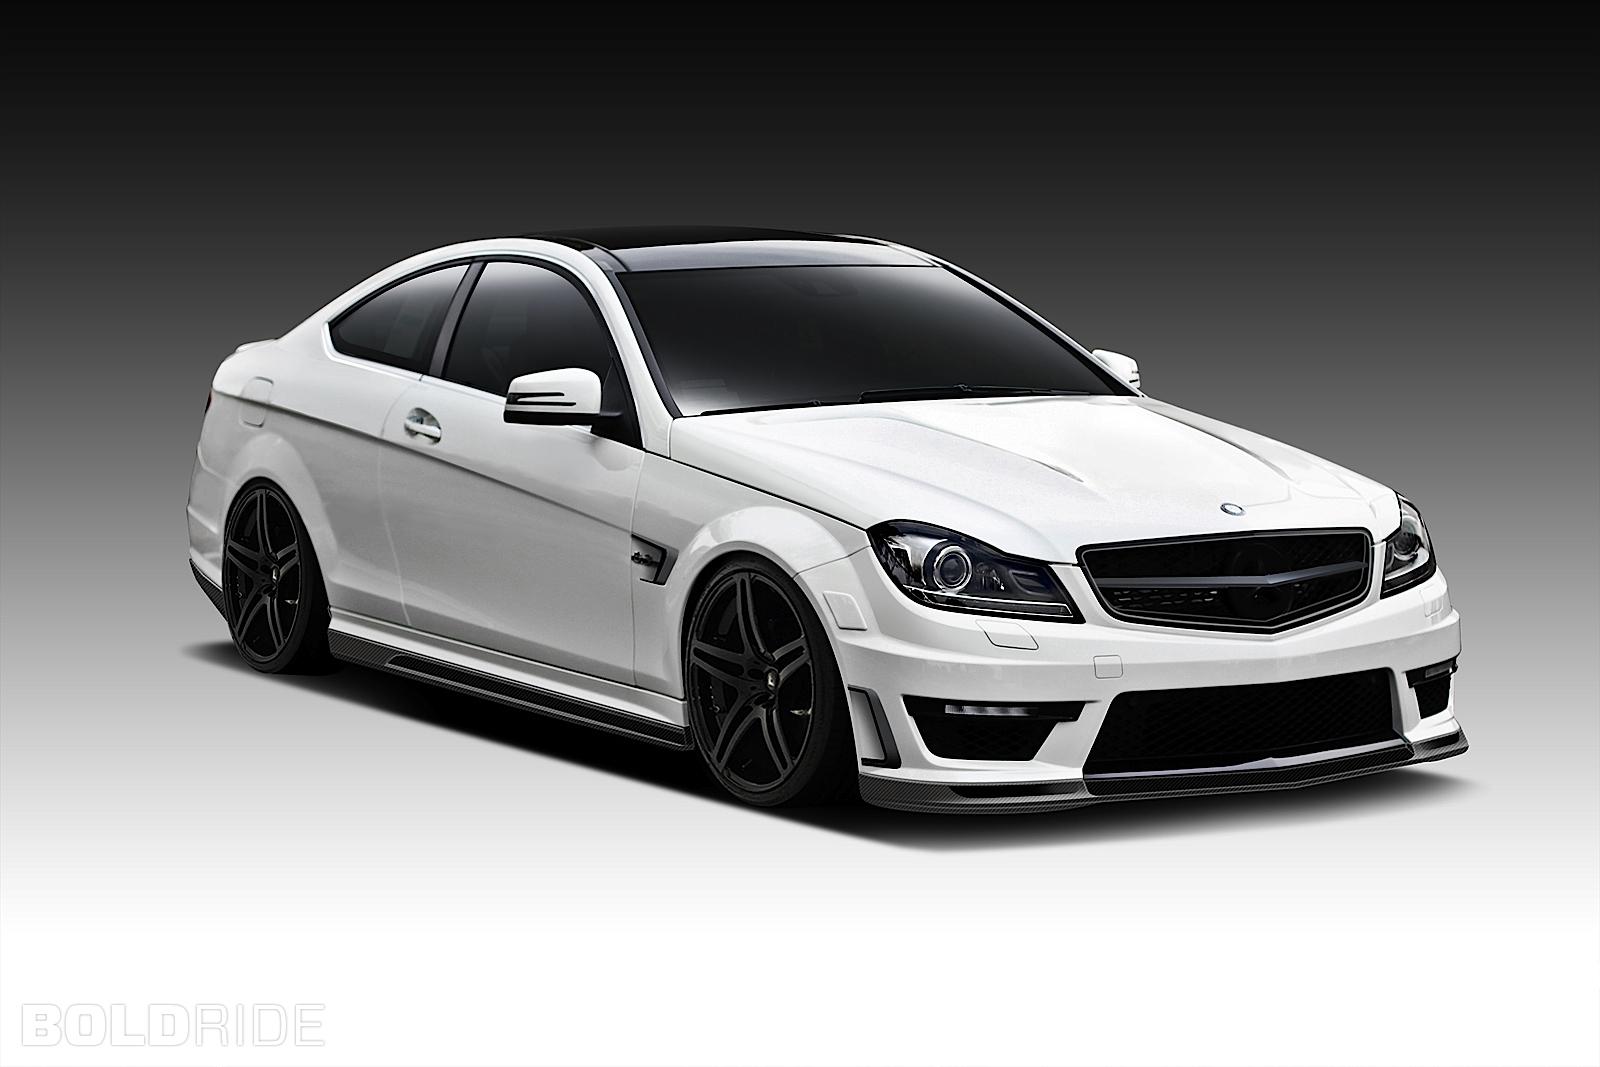 Mercedes benz c63 amg photos reviews news specs buy car for Mercedes benz c63 amg review